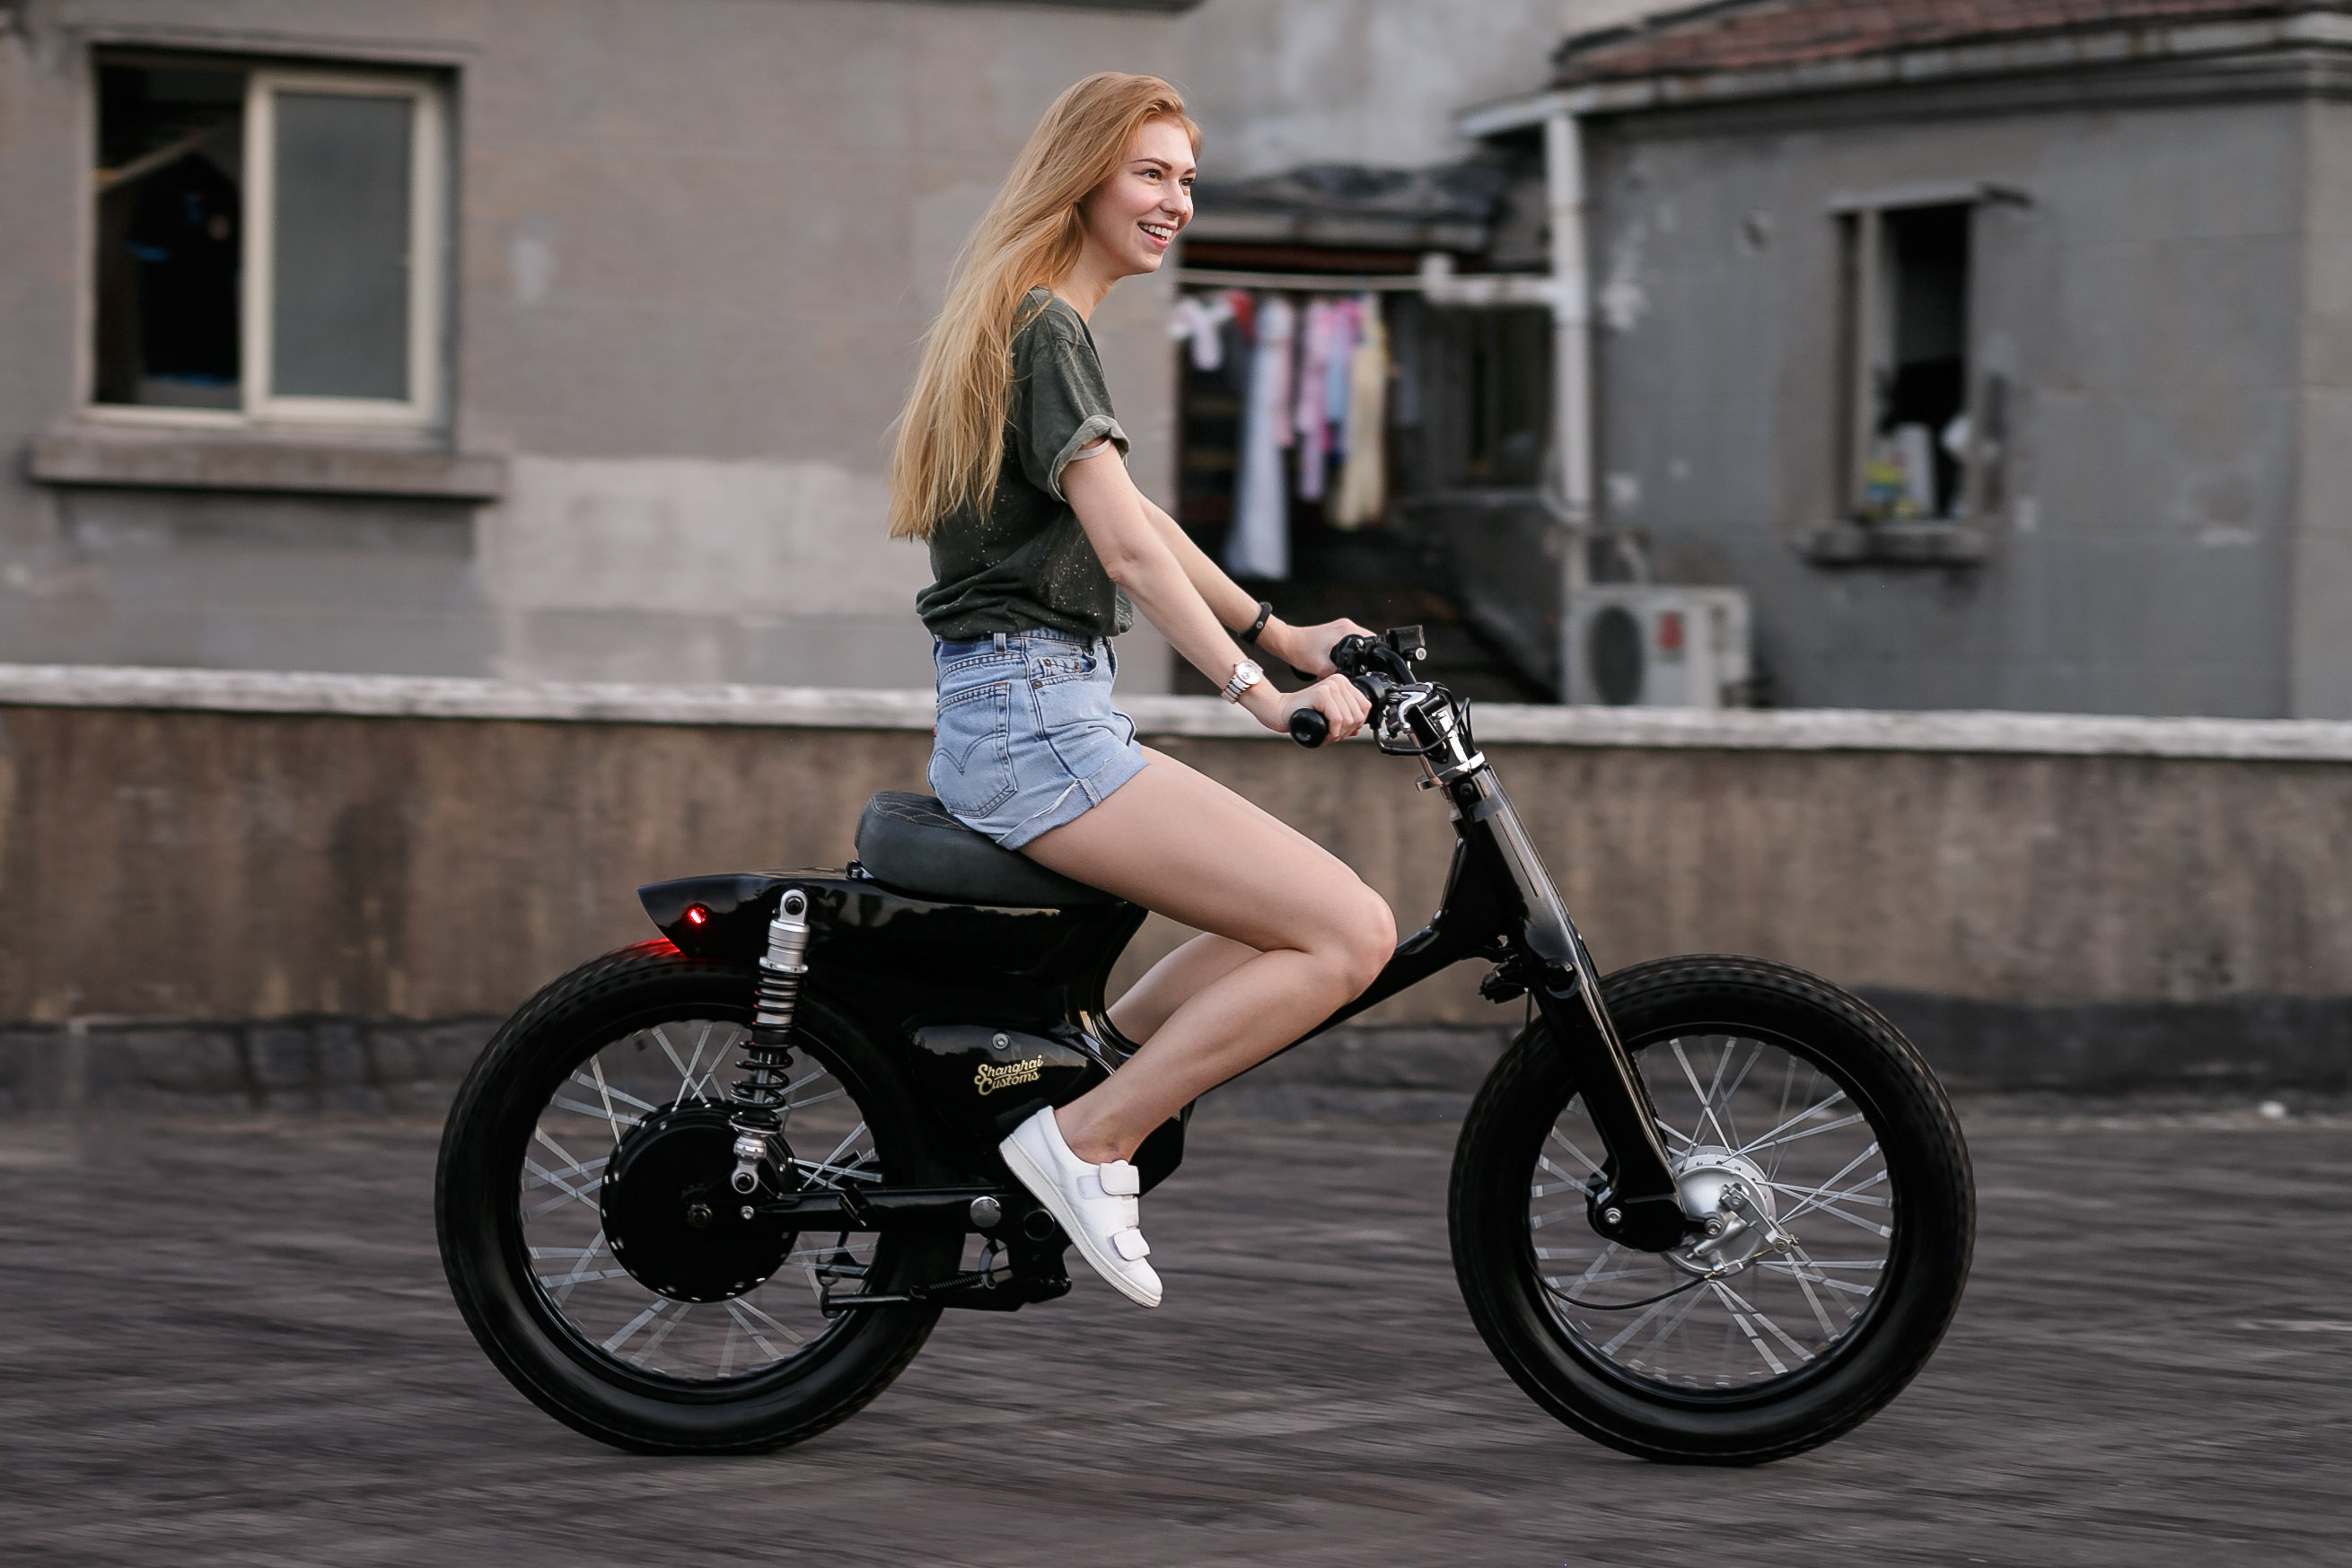 Ecub Electric Motorcycle By Shanghai Customs Evnerds